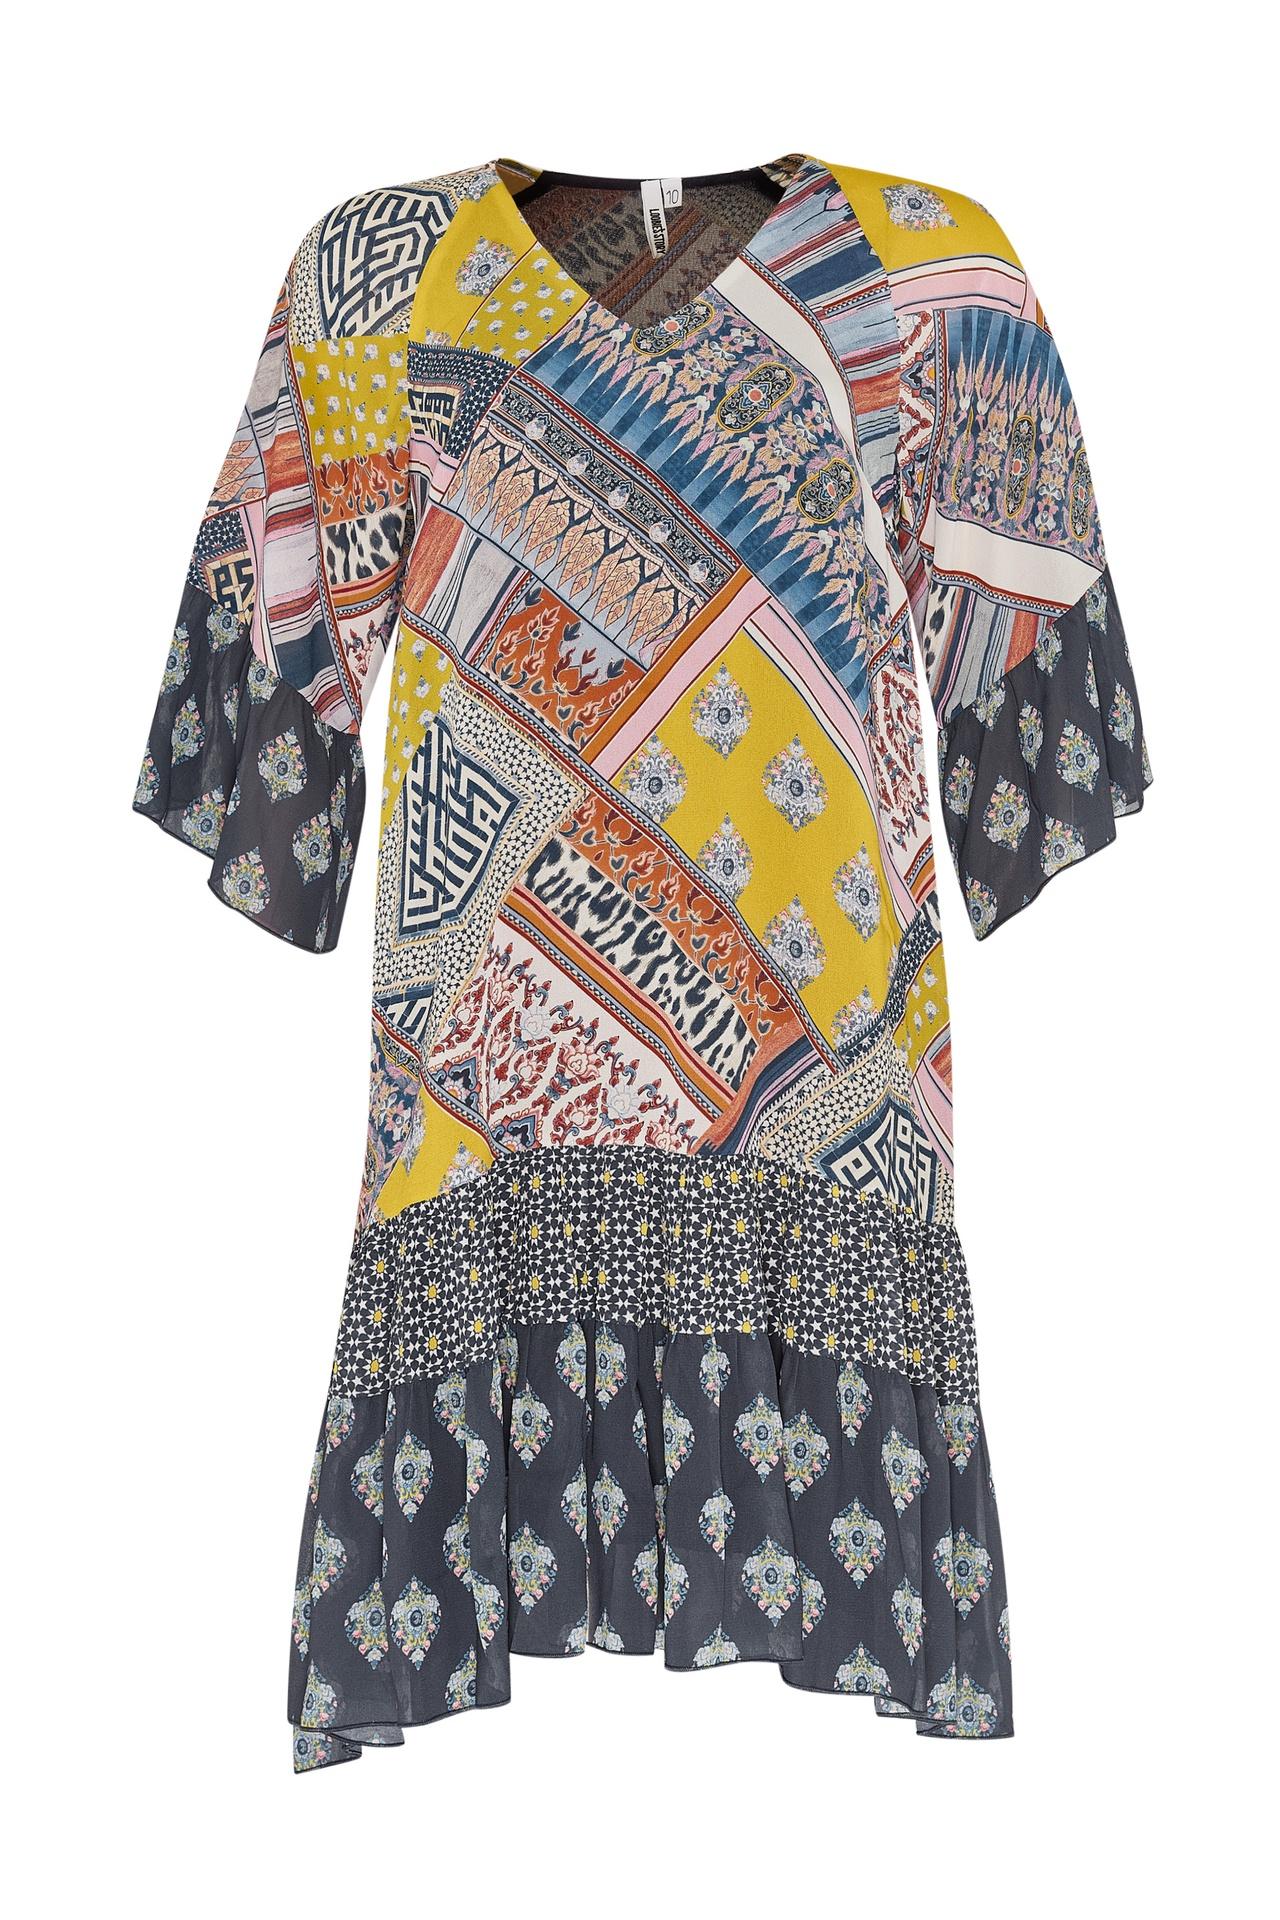 ls1359 St Tropez Dress